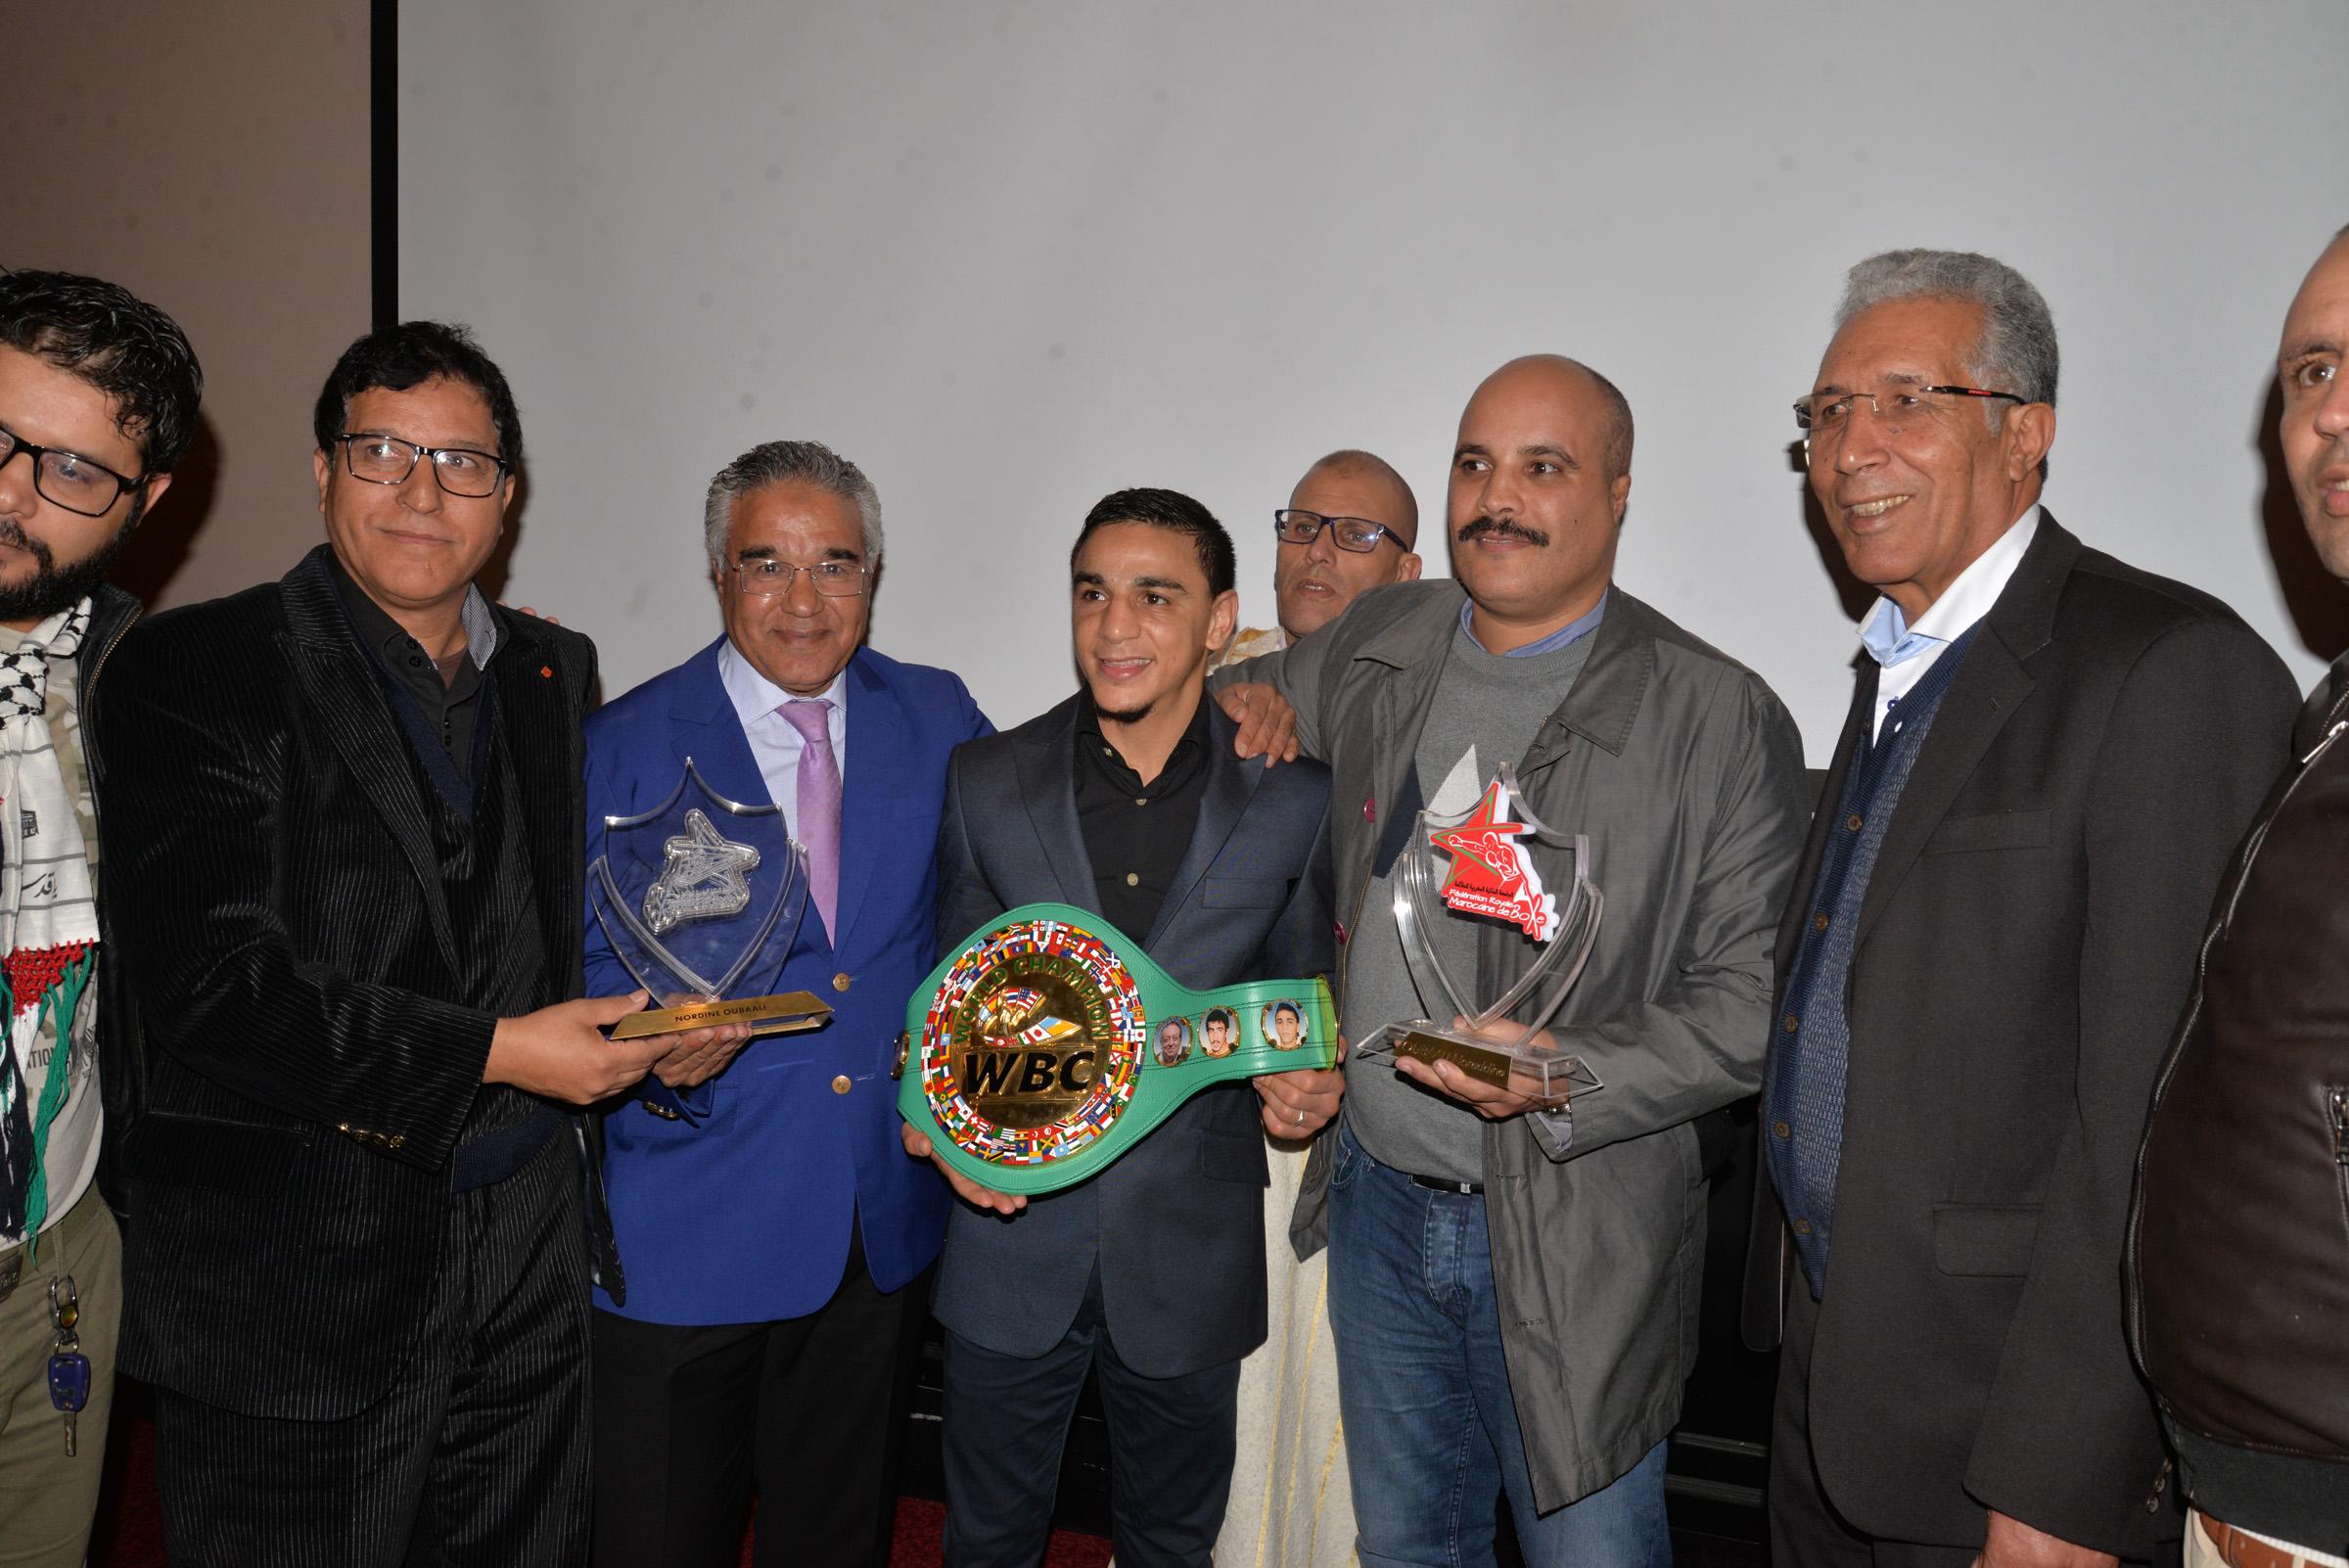 Boxe : la FRMB rend hommage à Nourredine Oubaali